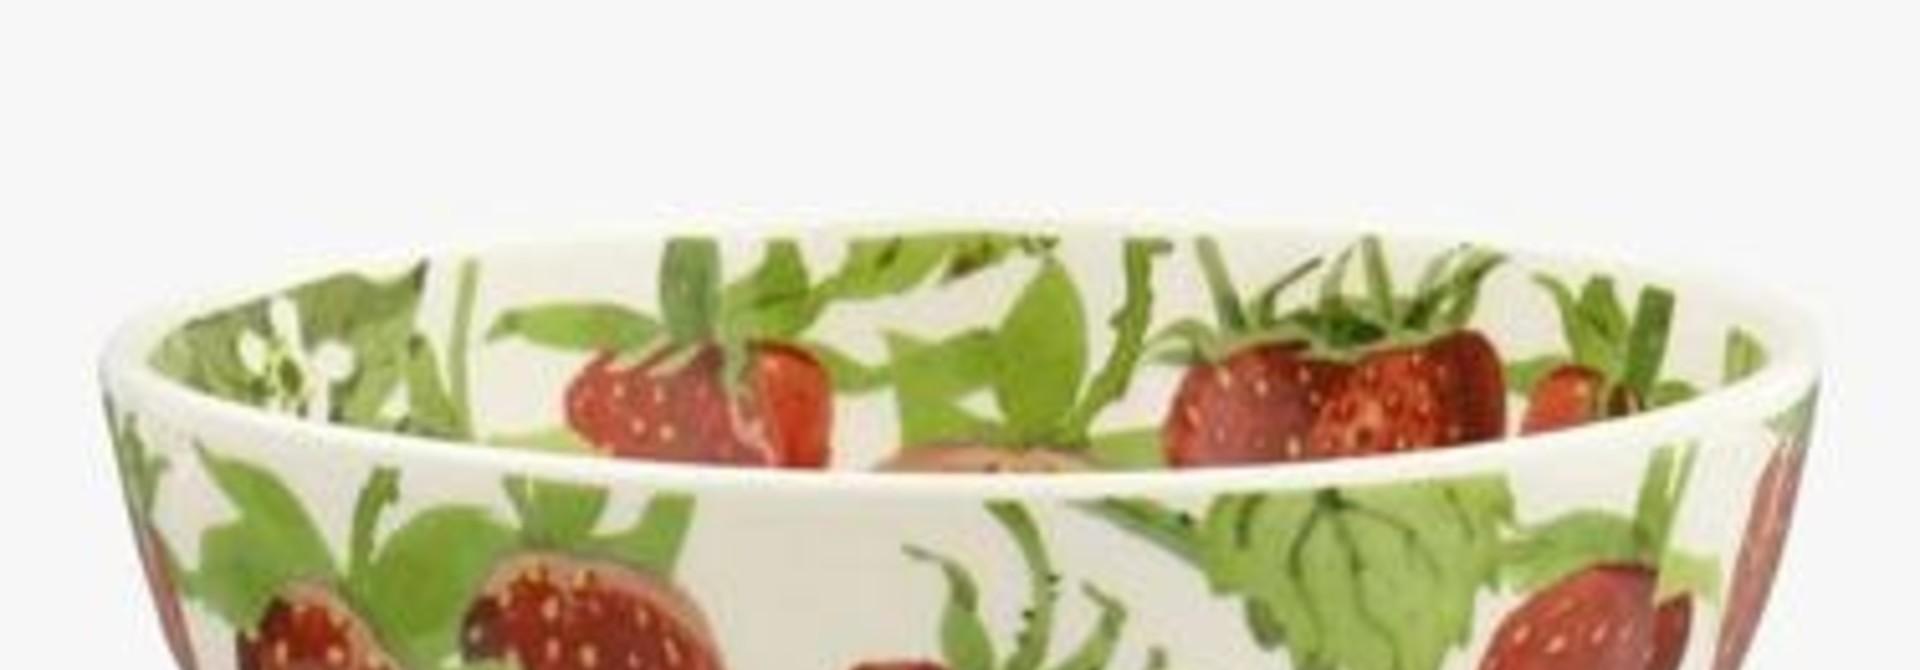 French Bowl - Strawberries